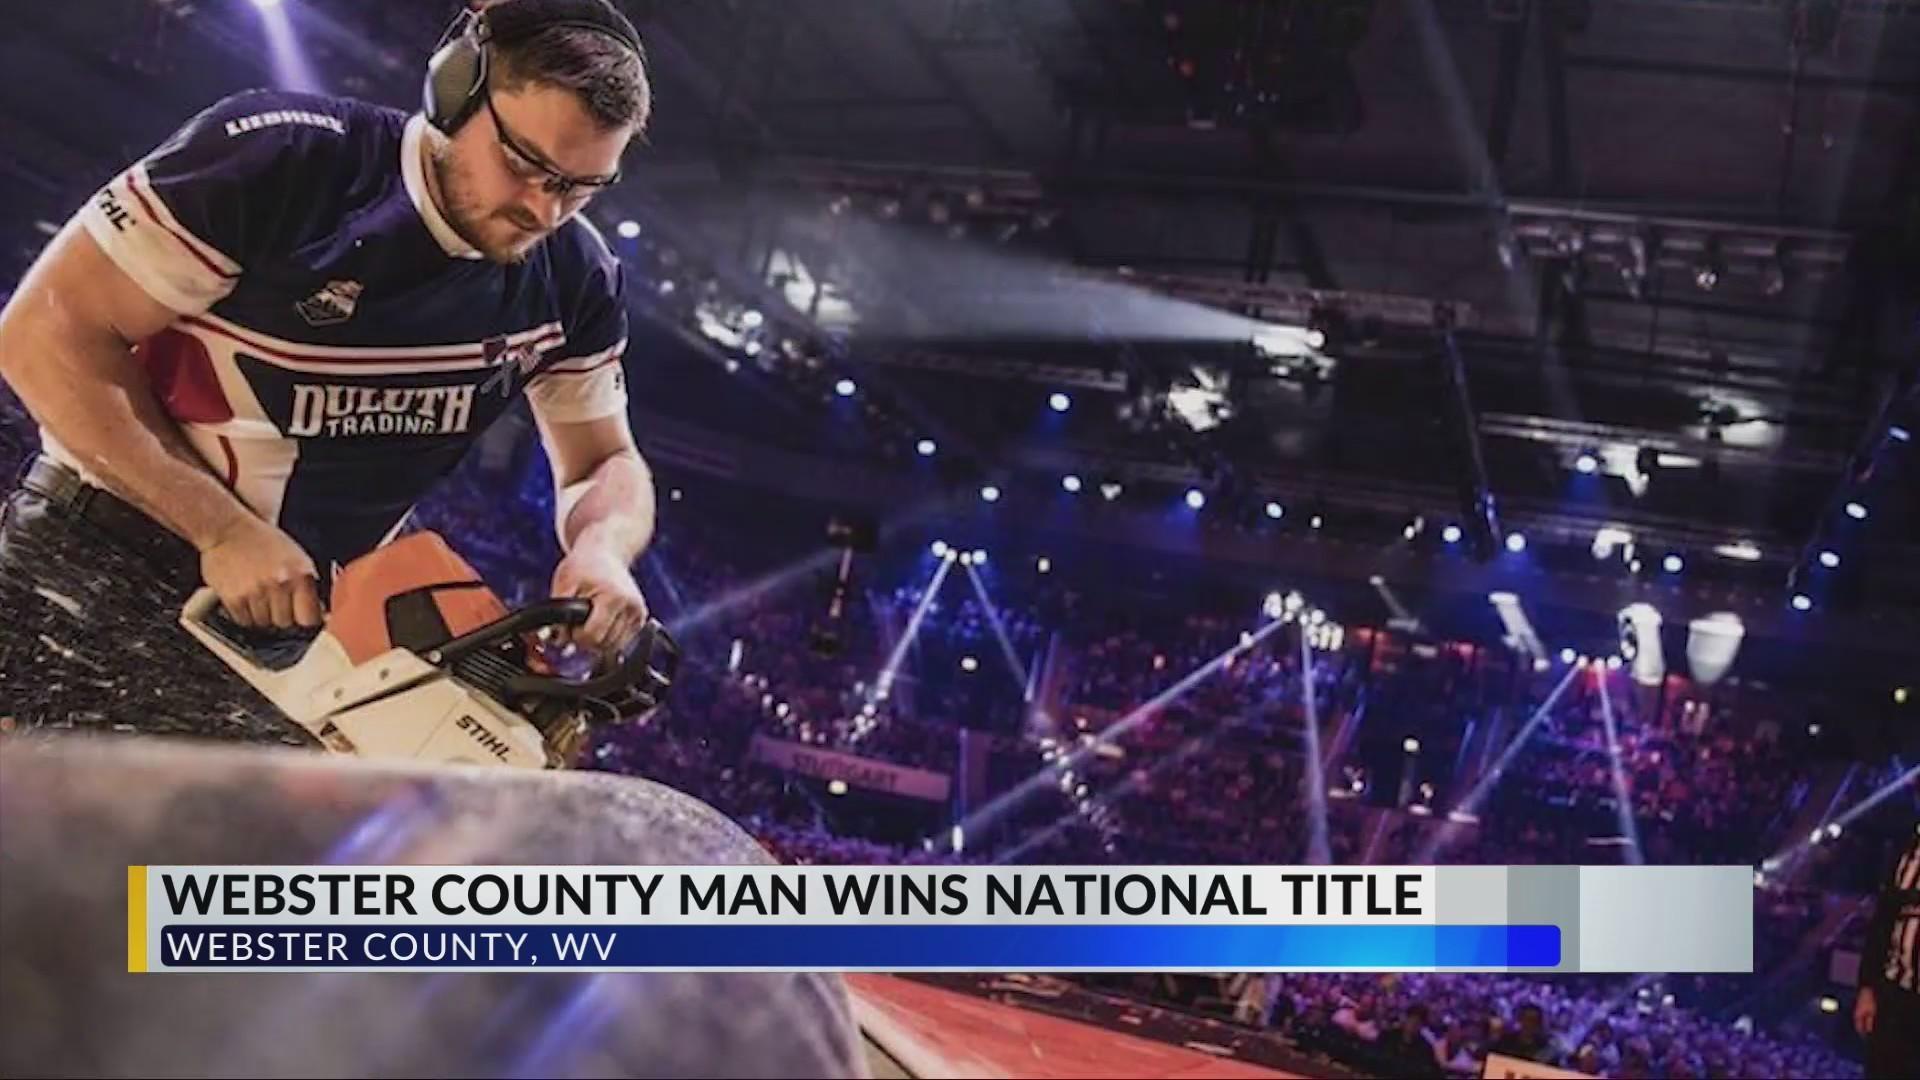 West Virginia Lumberjack Competes Internationally